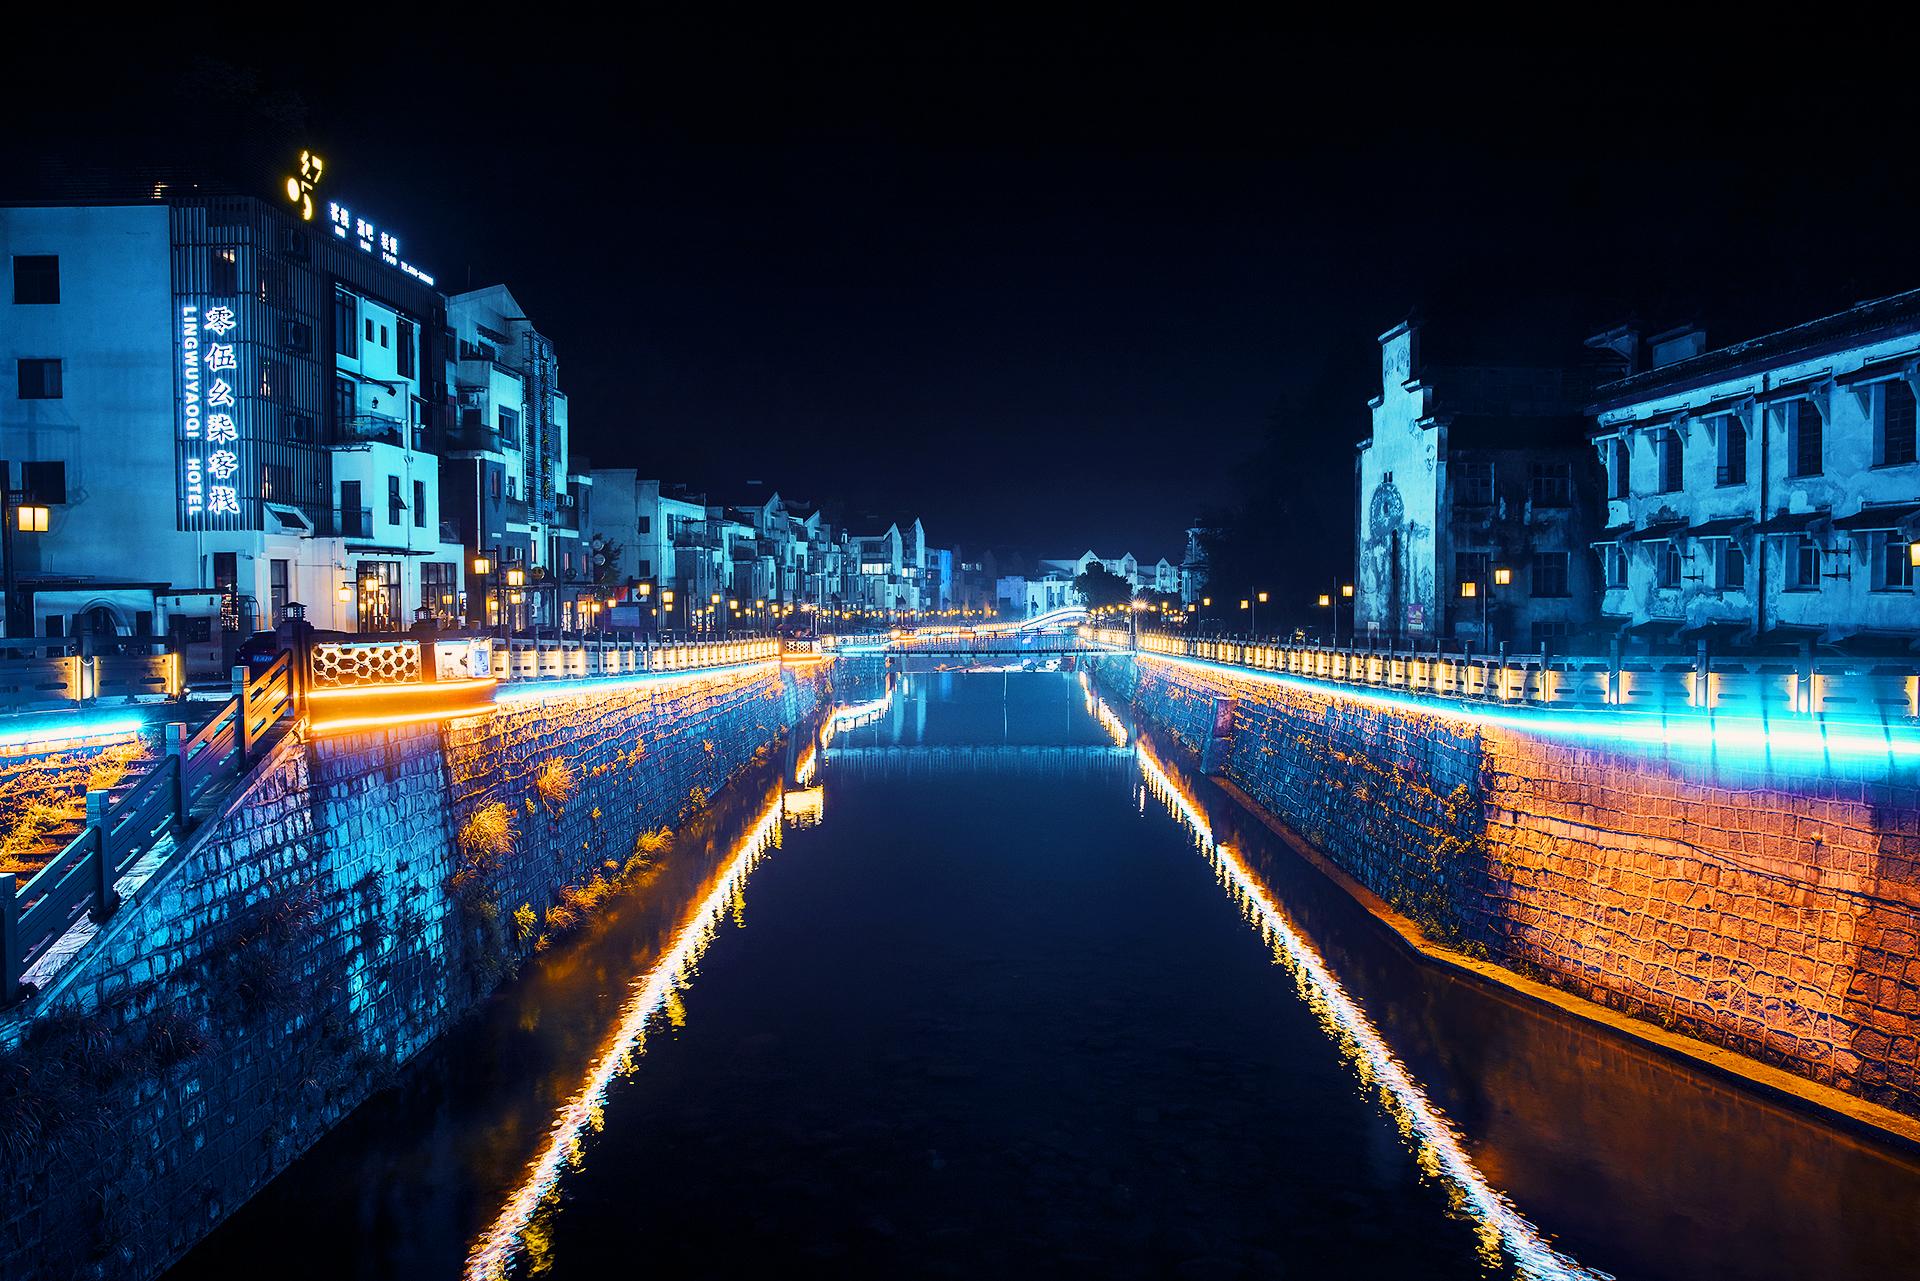 Night lights in Tangkou Town